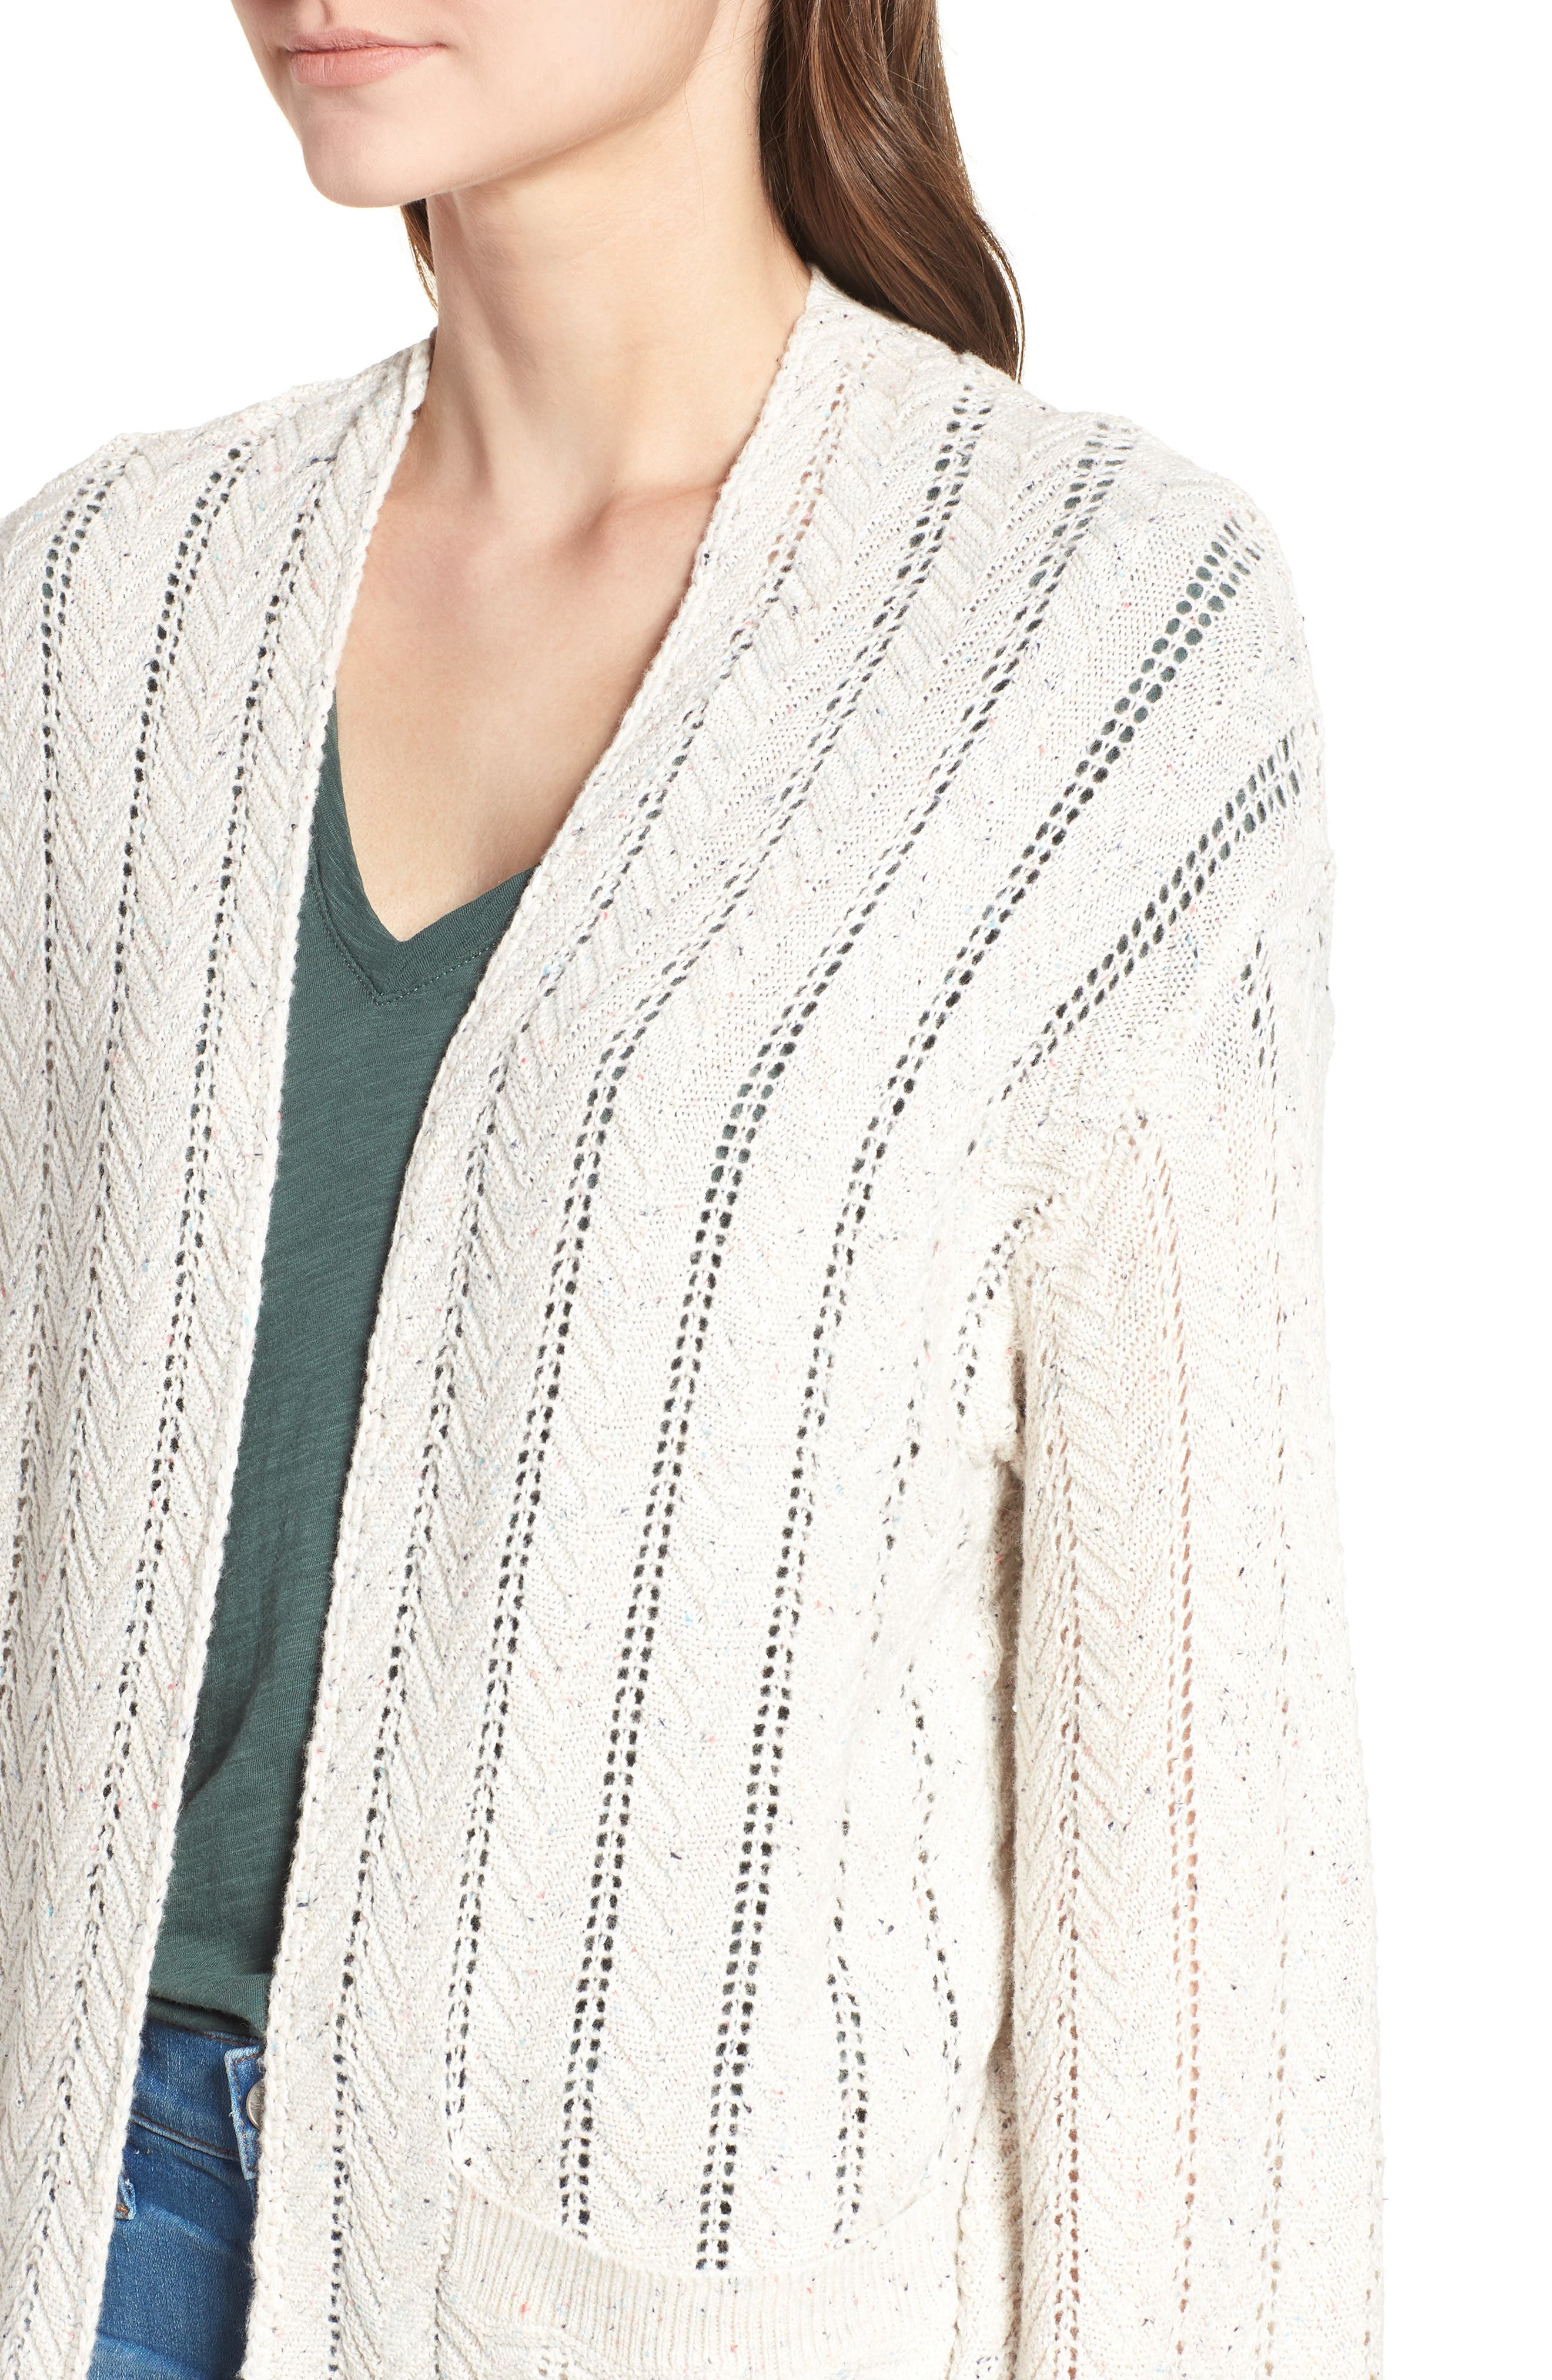 Long Tweed Herringbone Stitch Cardigan,                             Alternate thumbnail 4, color,                             Beige Oatmeal Heather